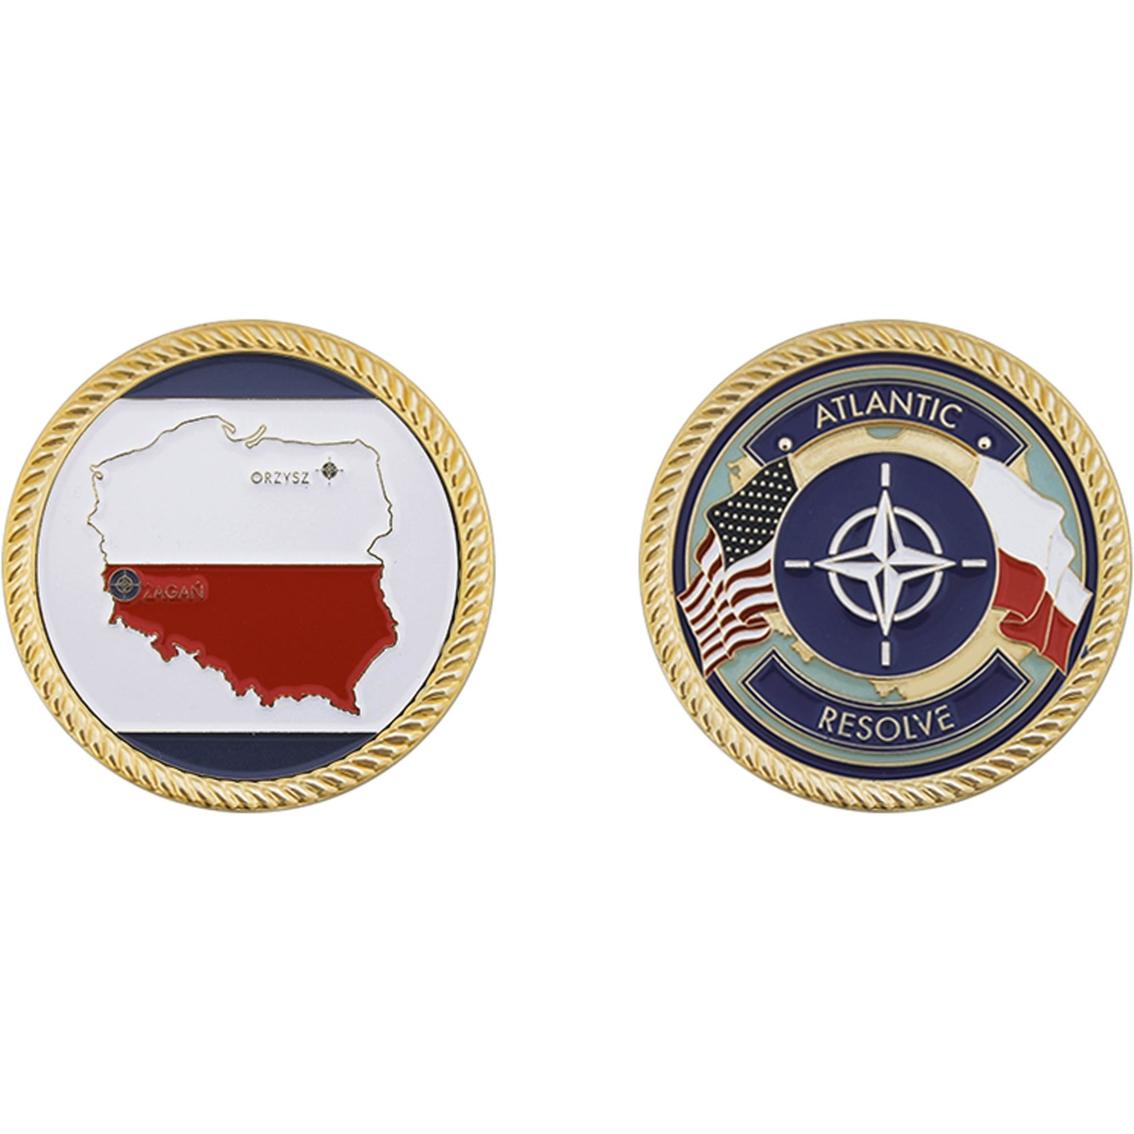 Challenge Coin Army Atlantic Resolve Poland Coin | Coins & Cases